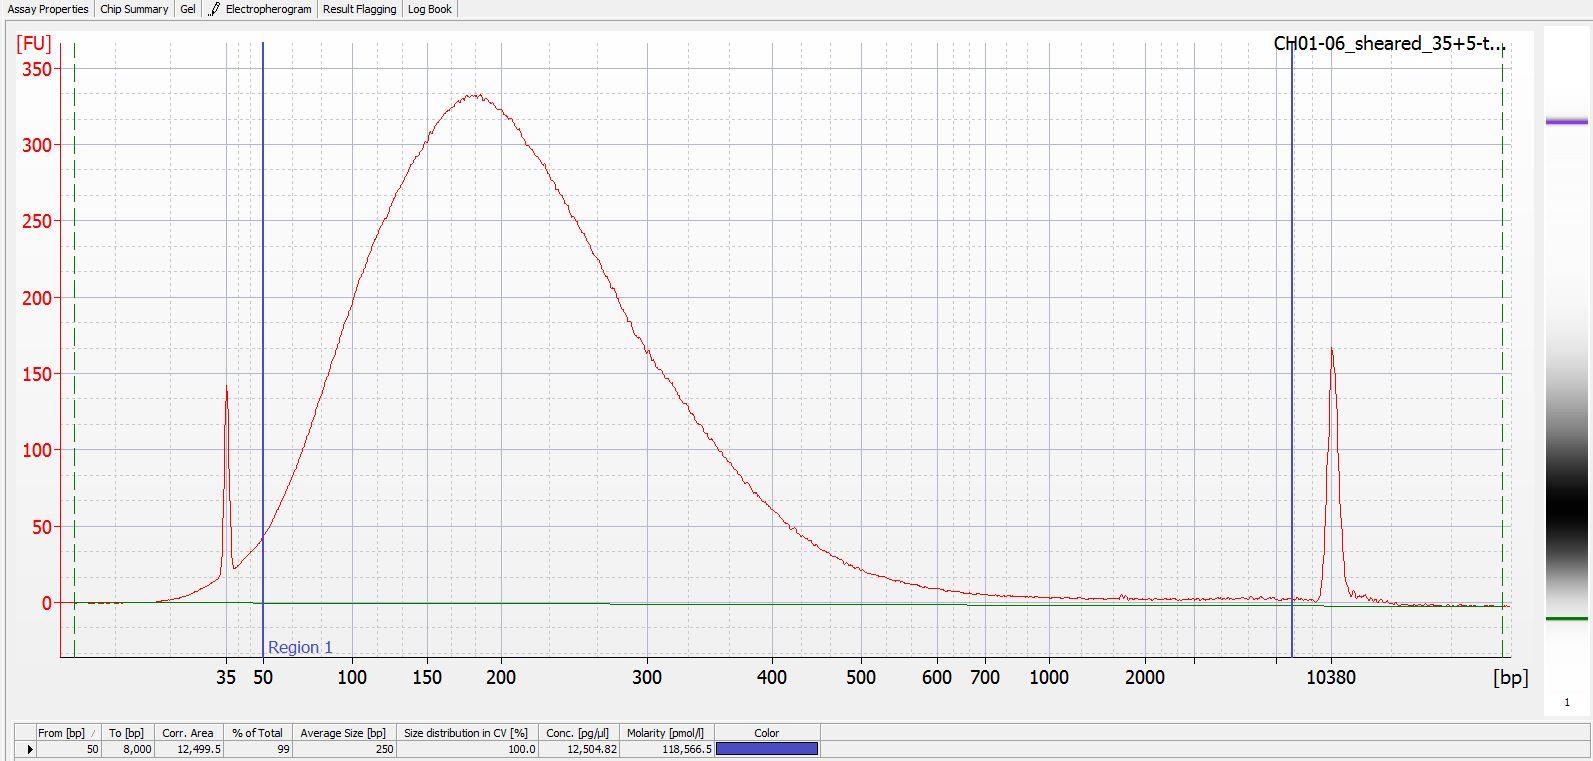 Sheared CH01-06 Bioanalyzer electropherogram